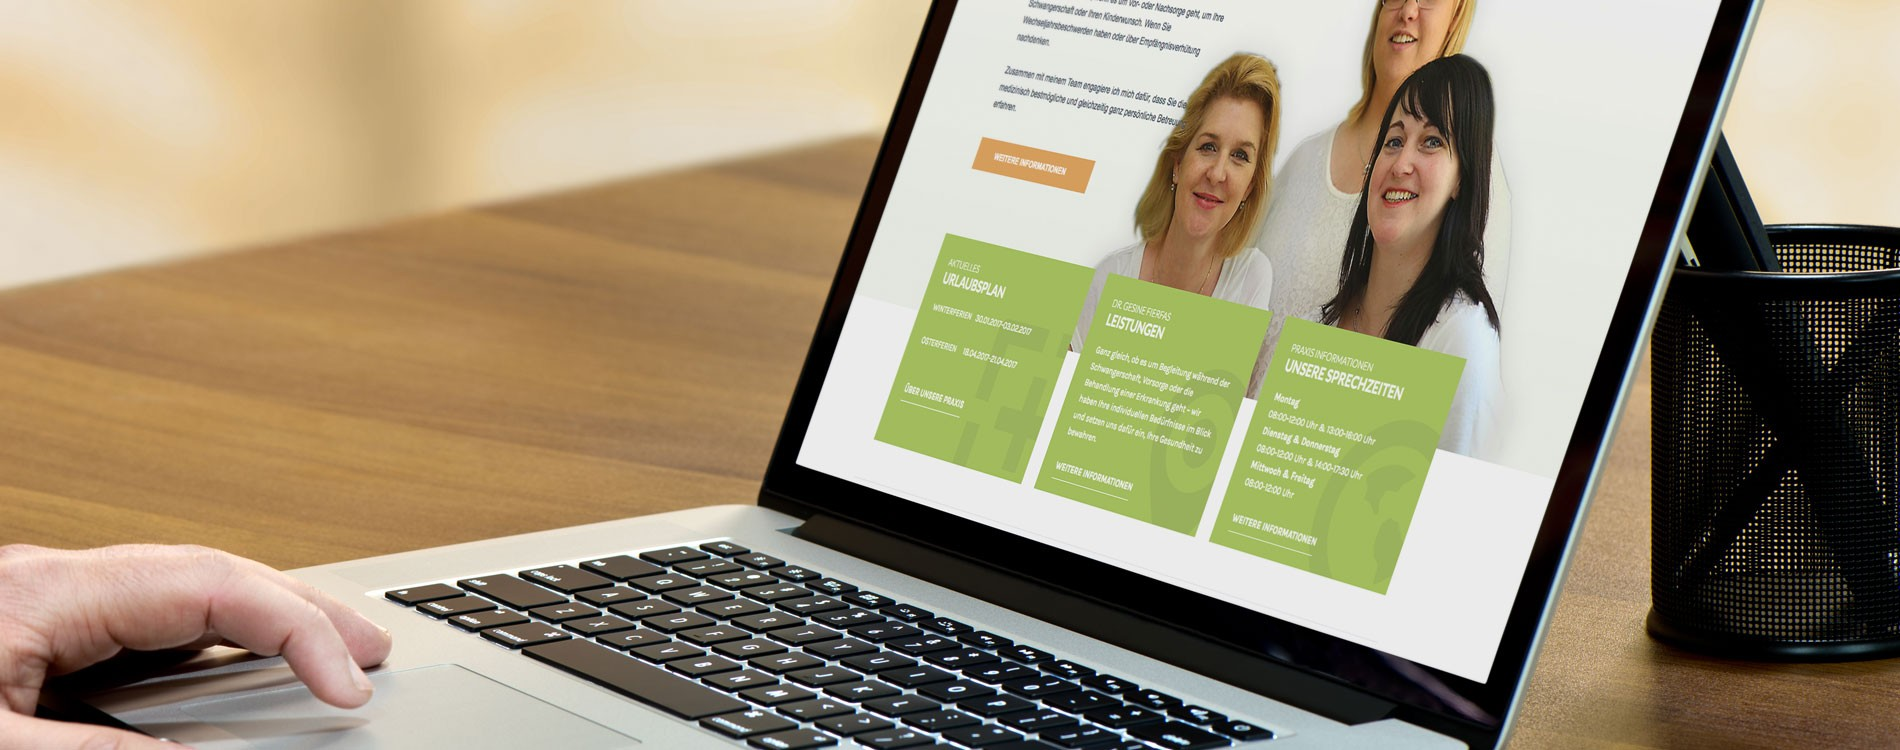 404MEDIA Projekt - Dr. med. Gesine Fierfas